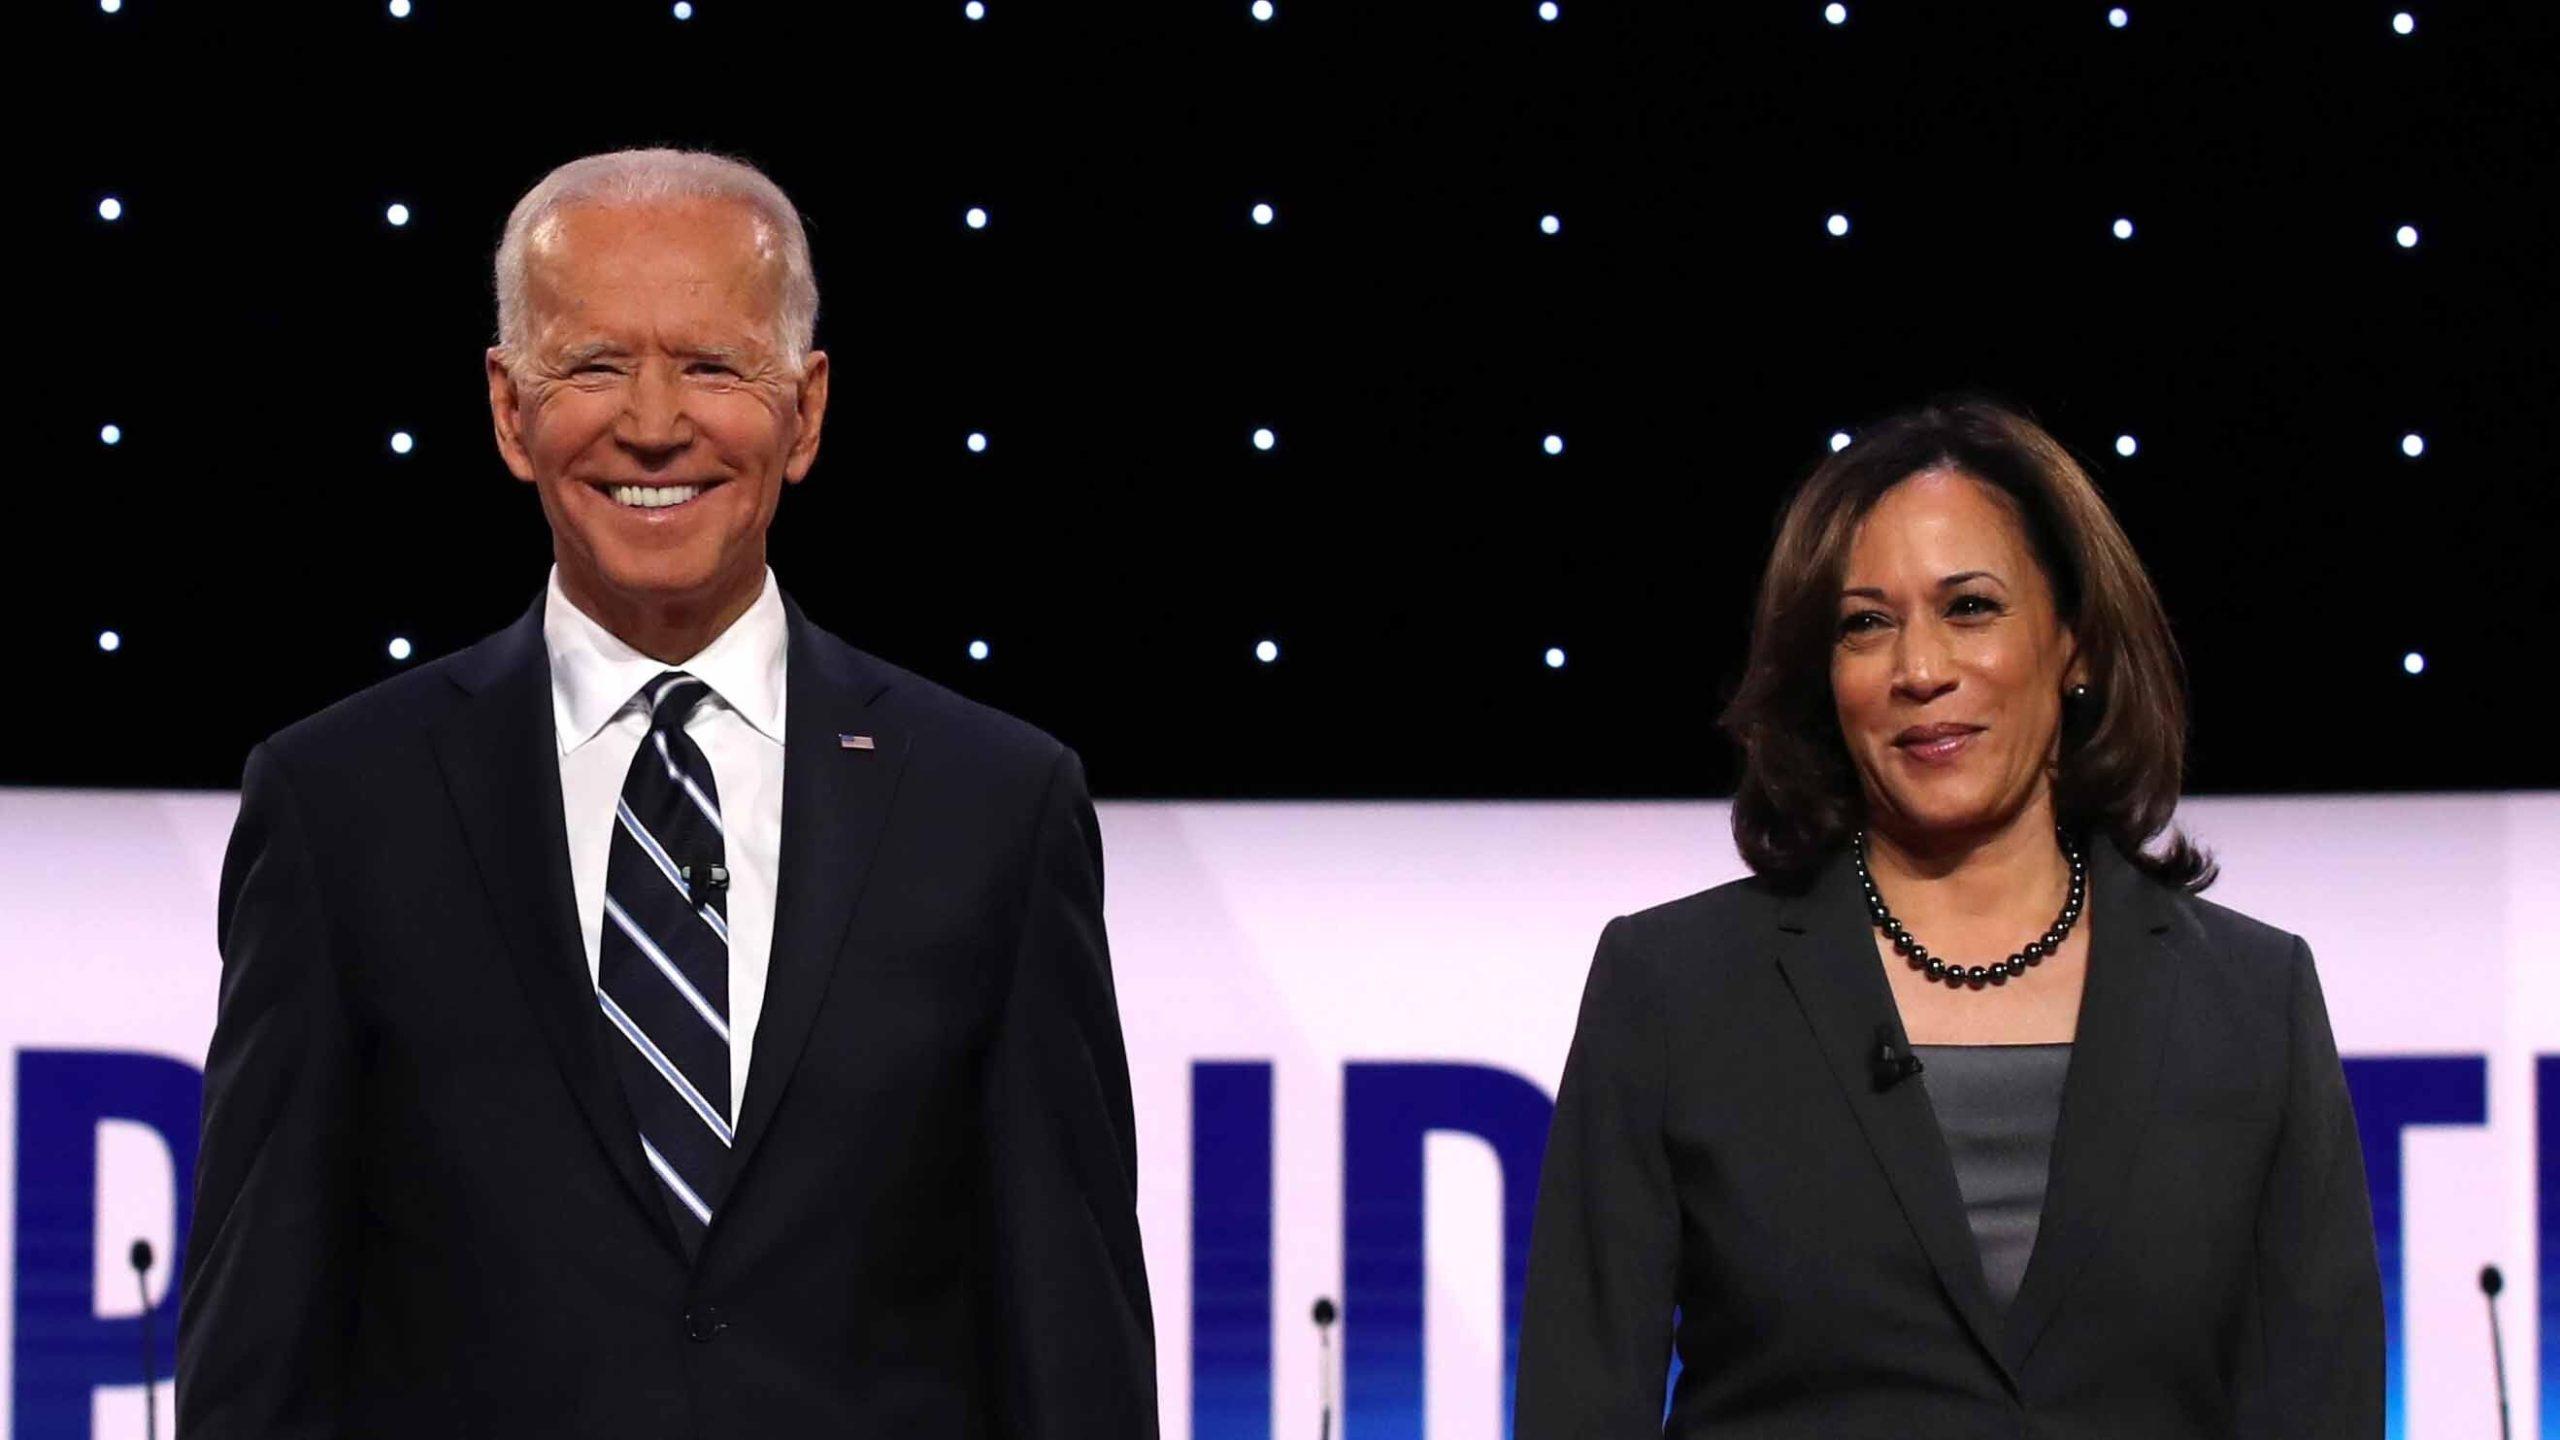 white male voters, Joe Biden, Kamala Harris